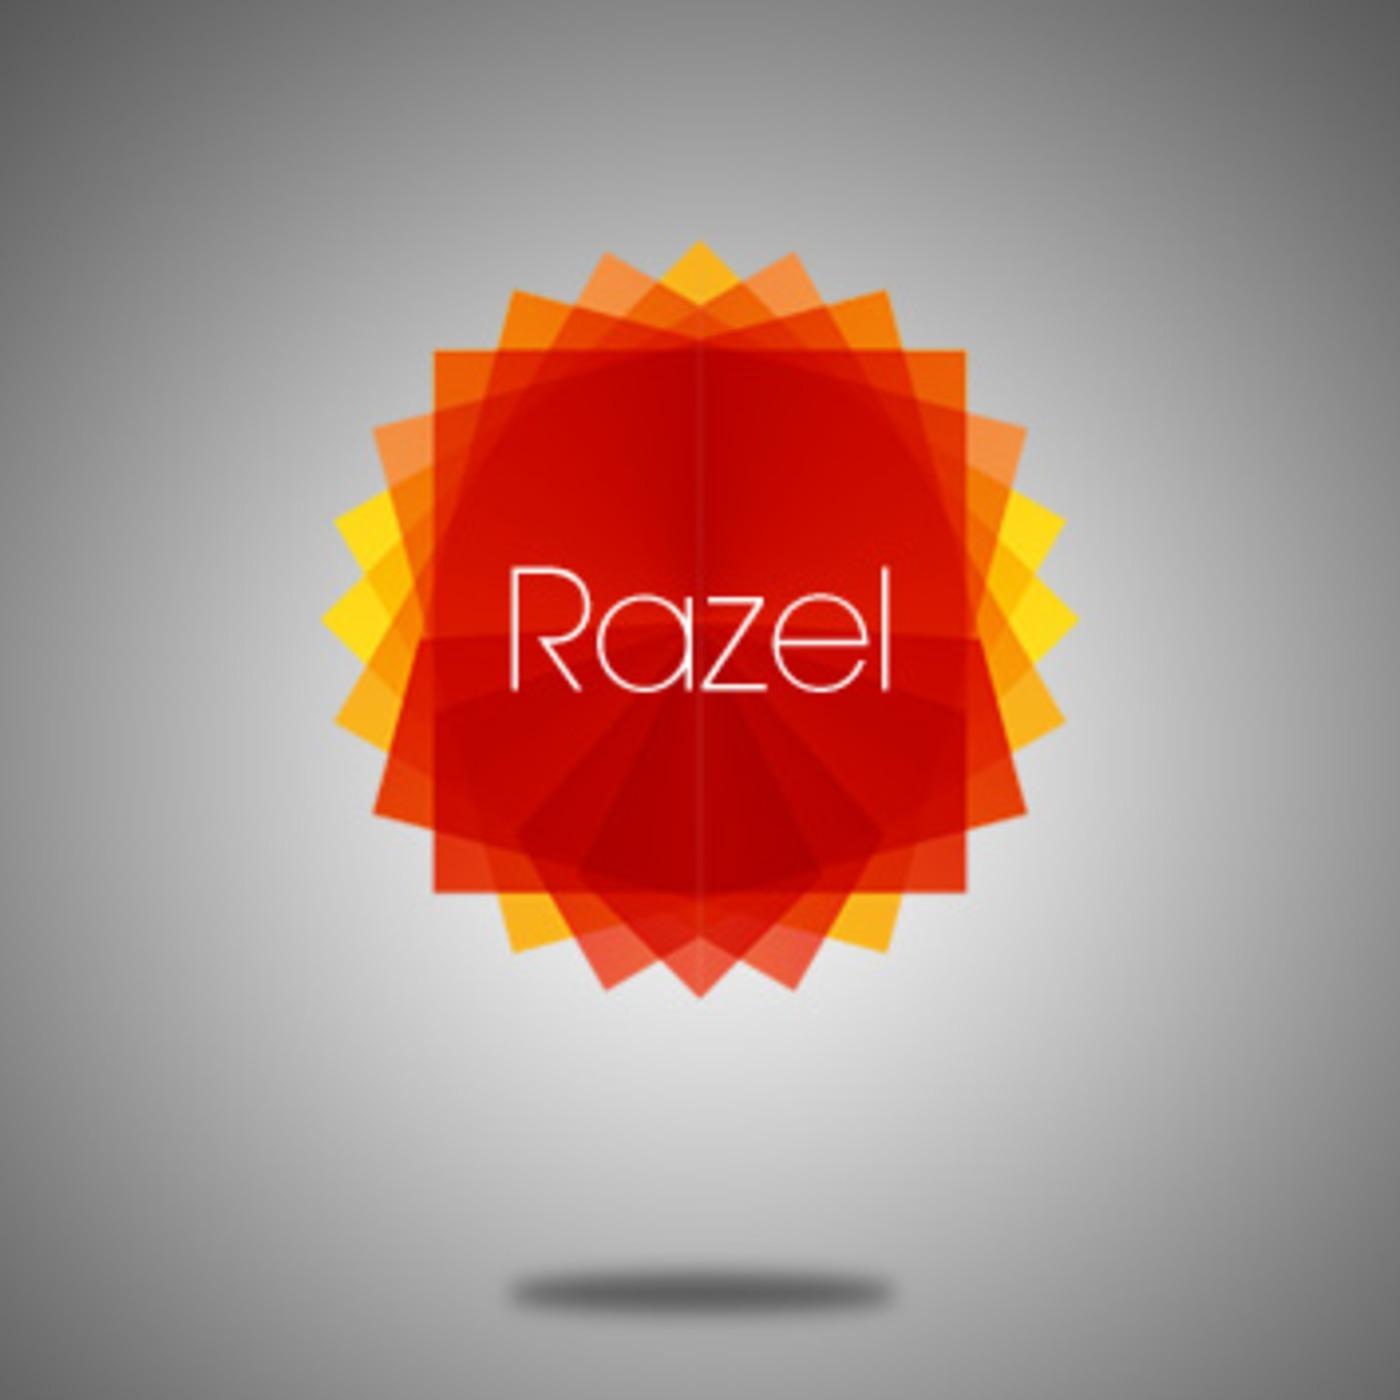 125 Creative Text Based Logo Designs For Design